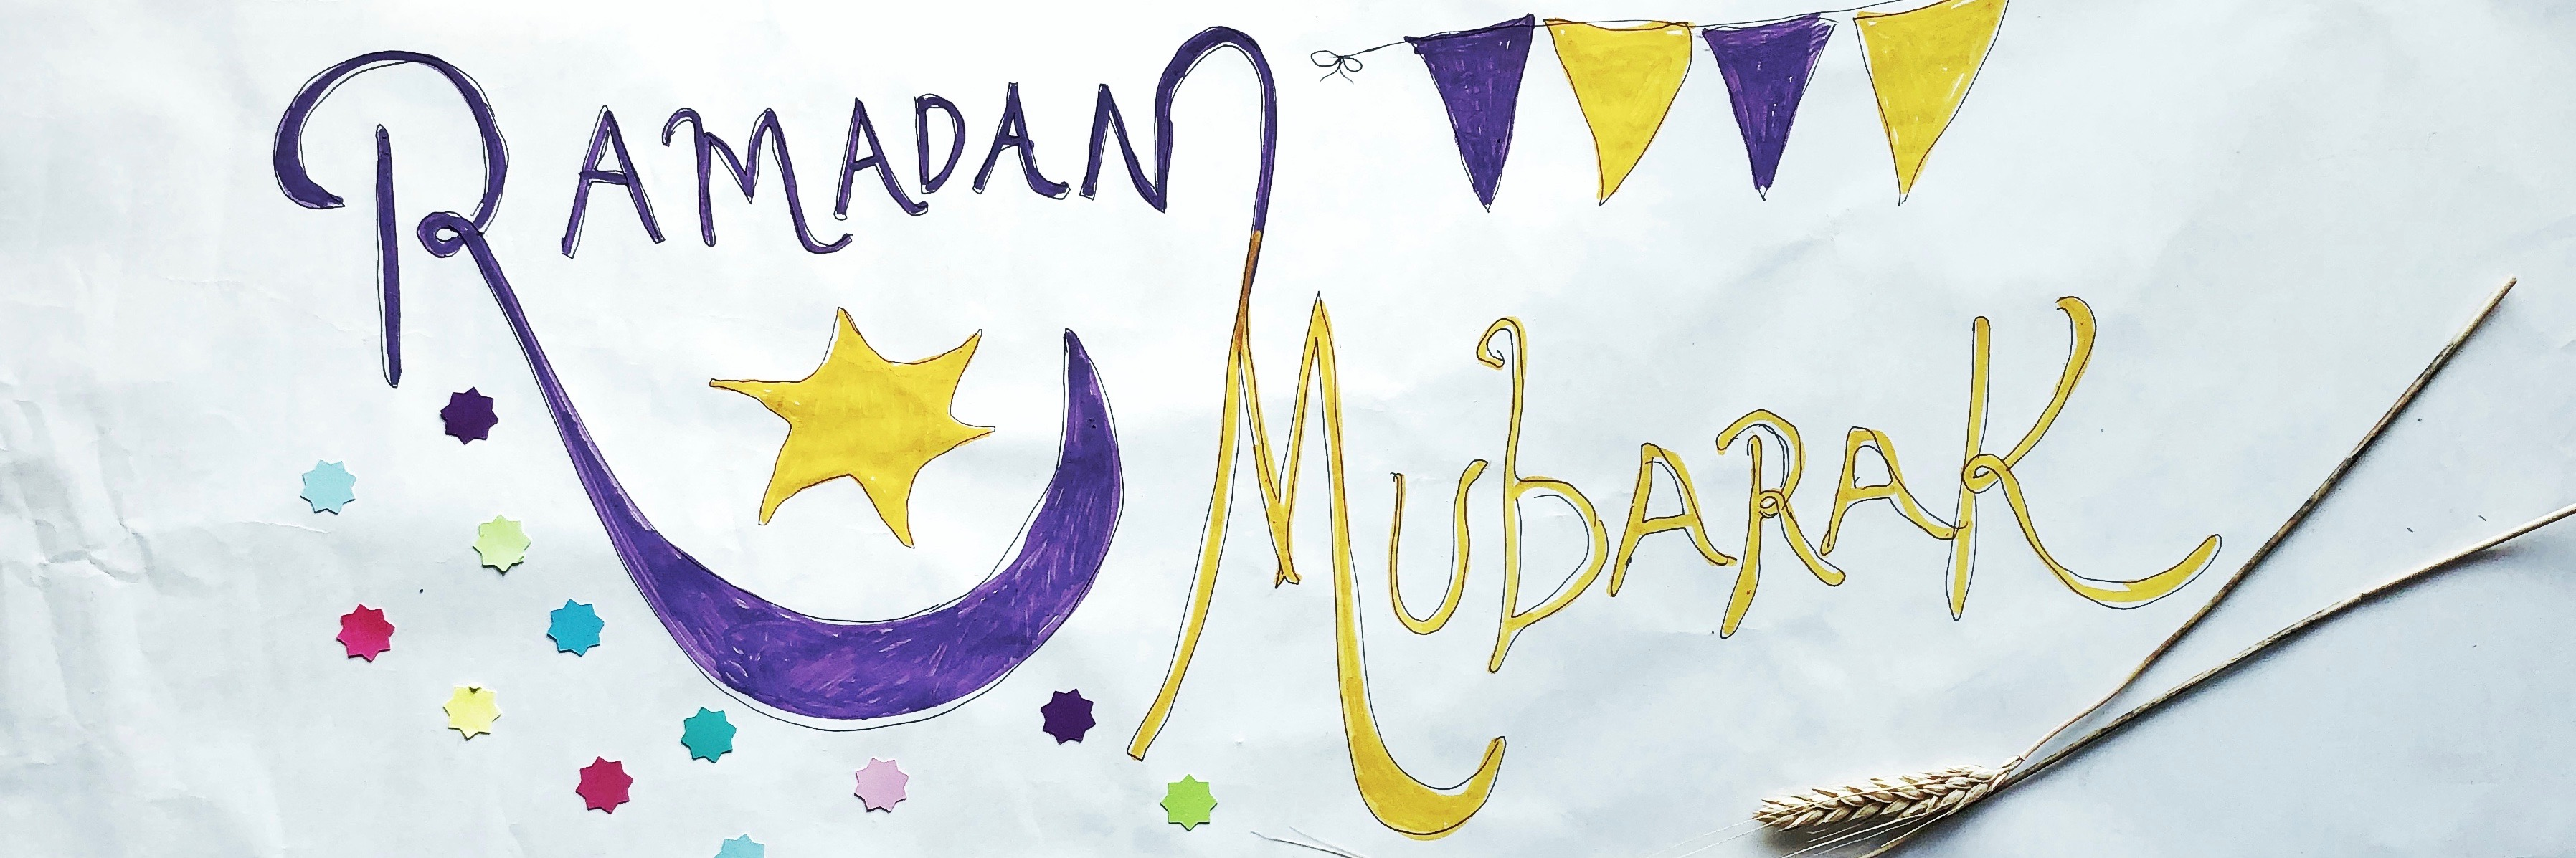 I am Not a Better Muslim in Ramadan